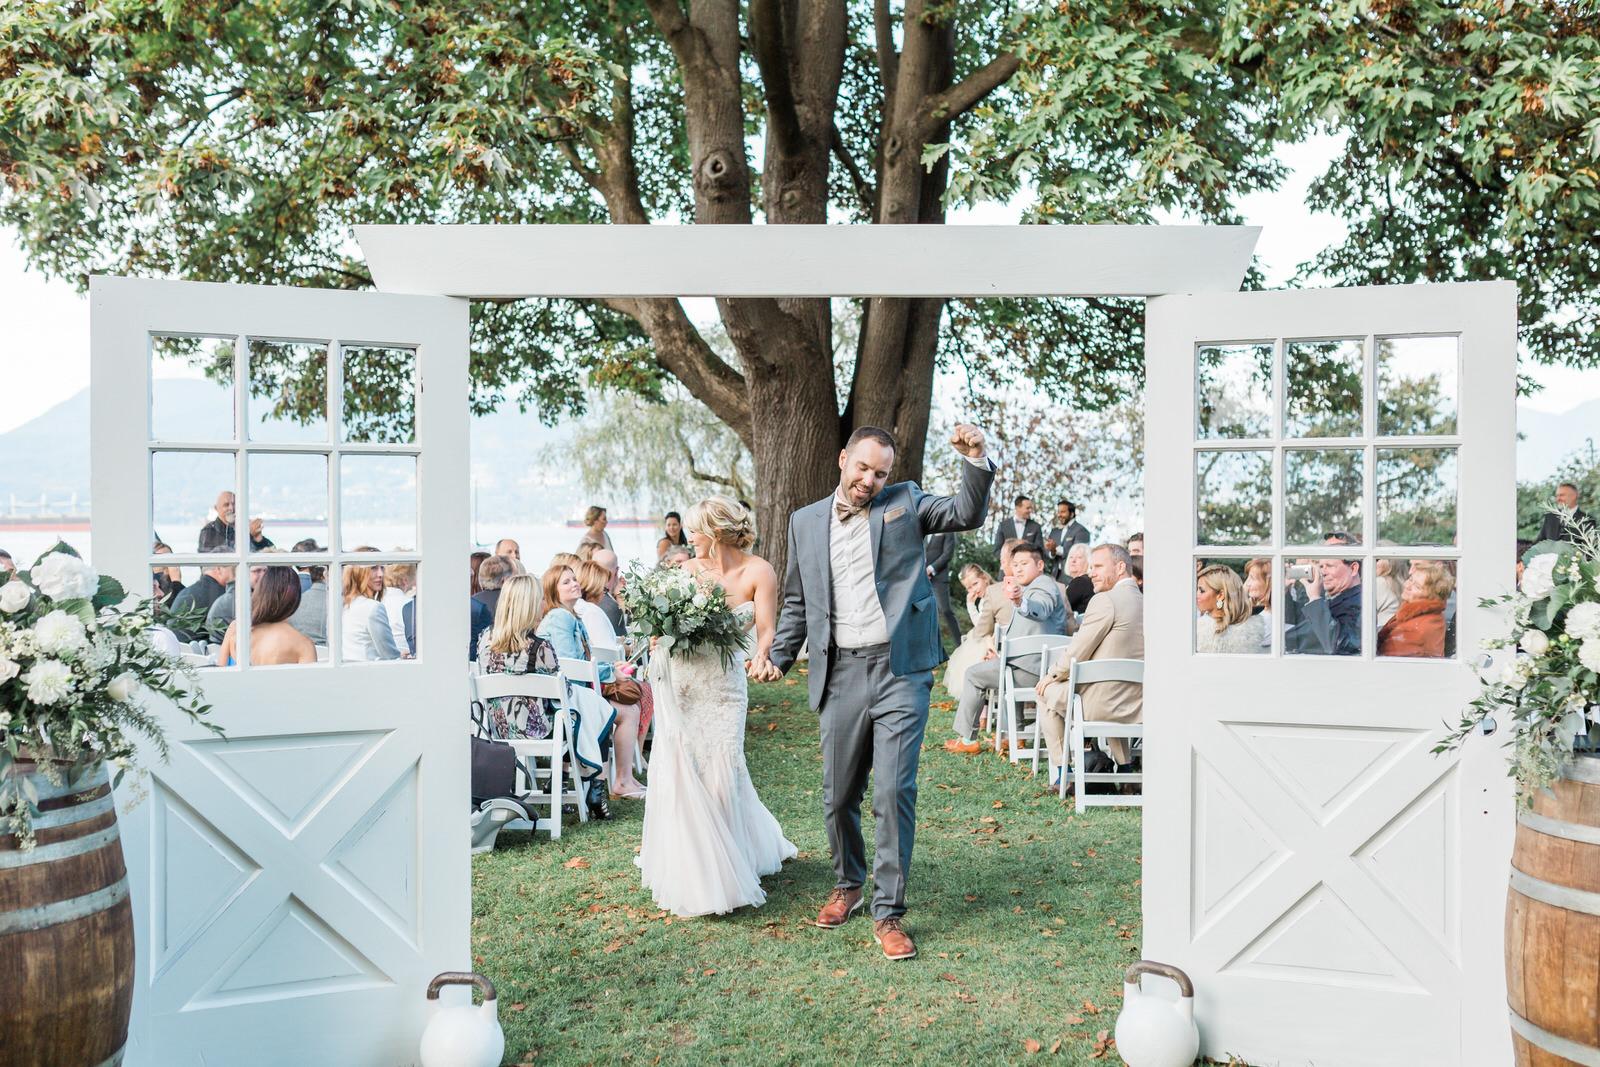 Sunshine Coast and Vancouver Wedding Photographer - Jennifer Picard - West Coast Weddings793.jpg